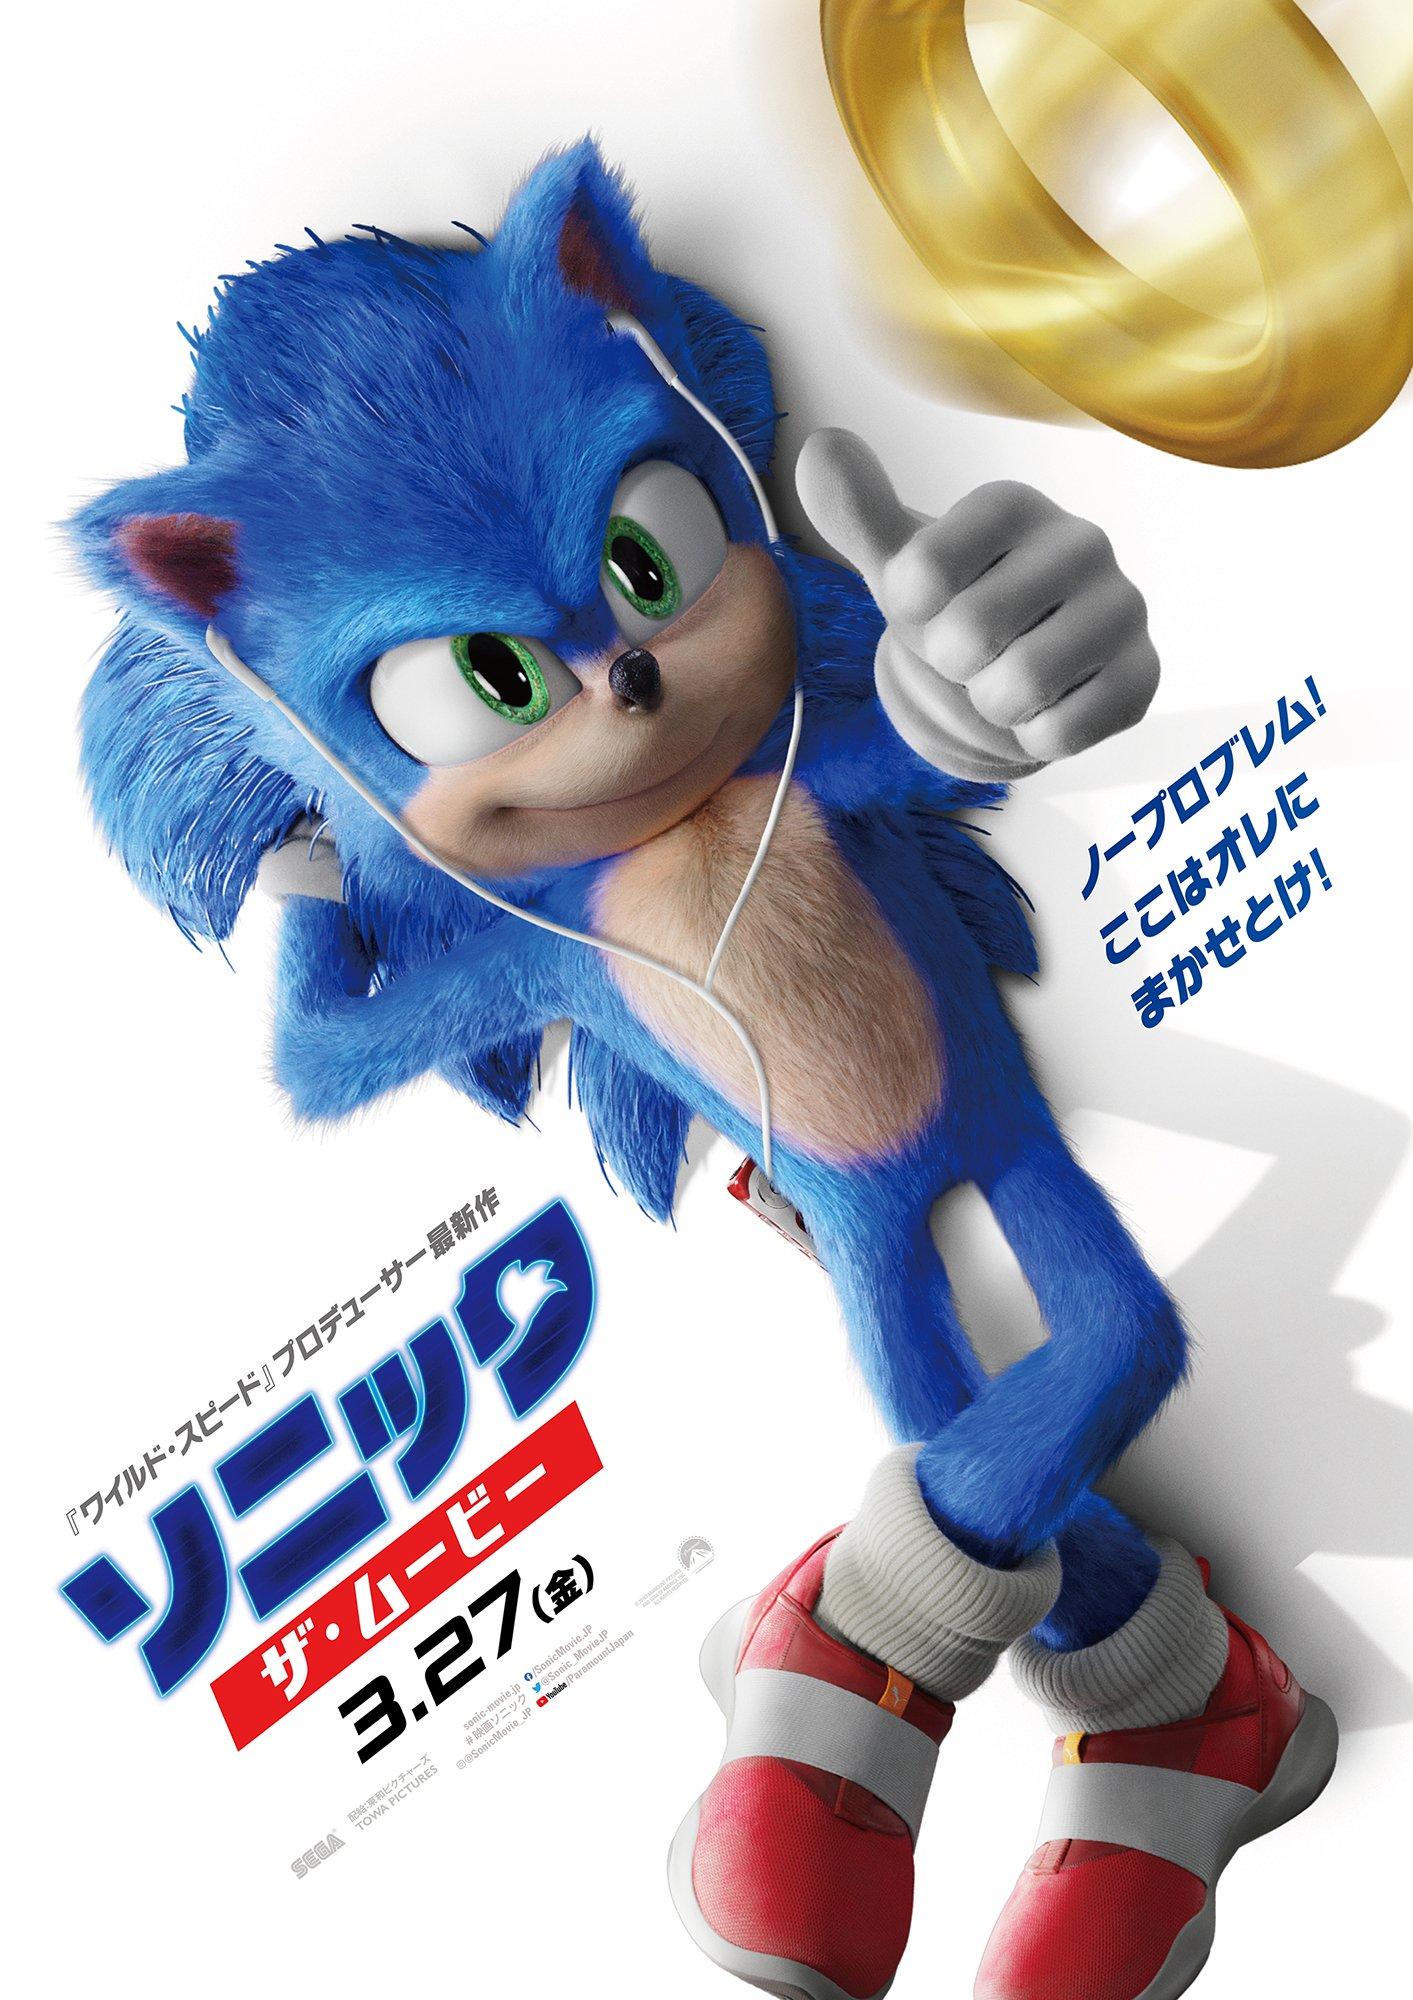 SonicLeFilm Affiche Japon